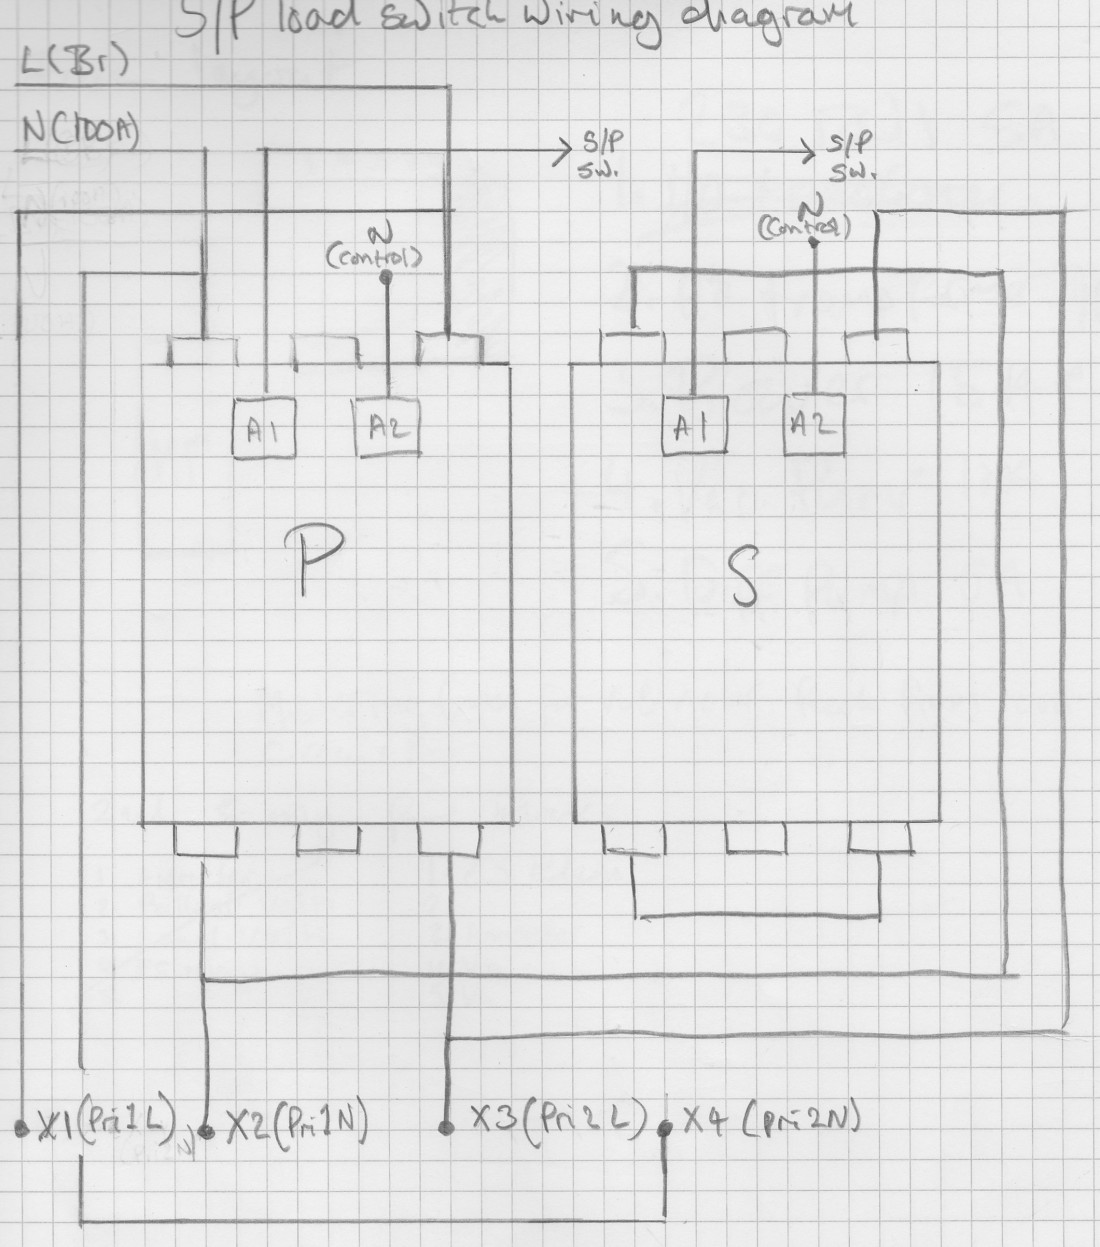 Control Freak Bmrs Neon Blog Ballast Wiring Diagram Additionally Ac Current Transformer Circuit S P Switch 1